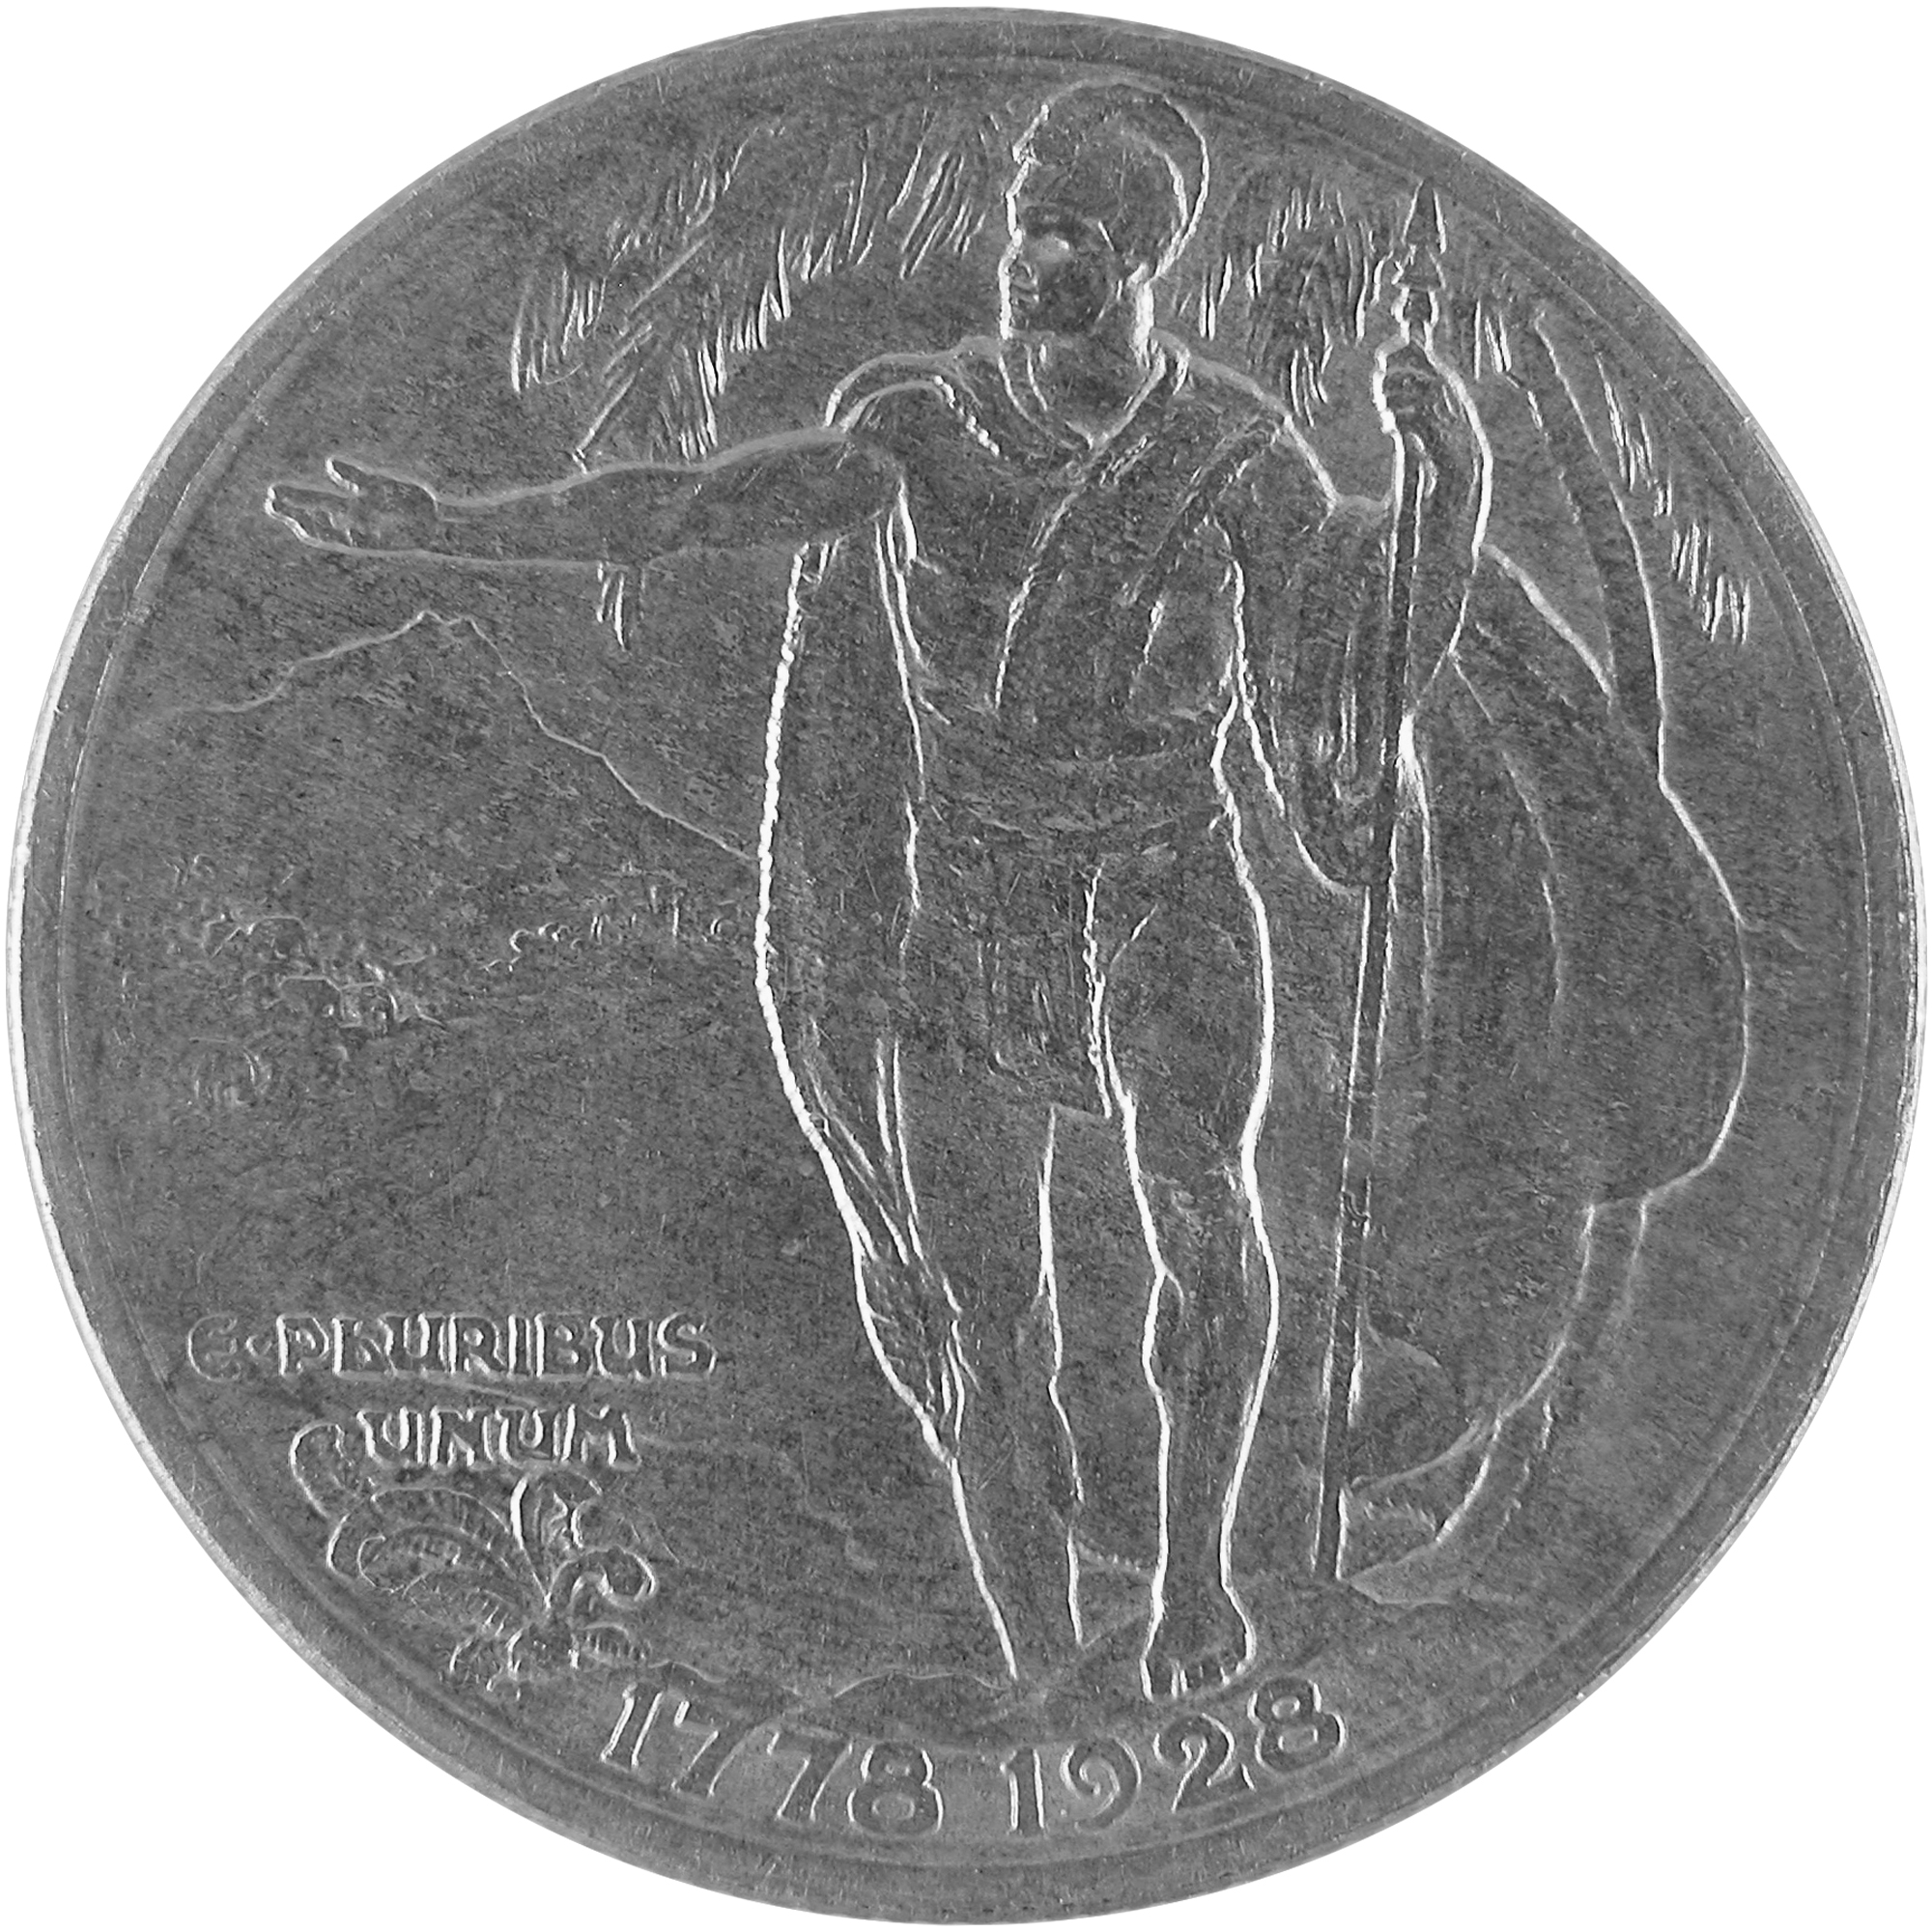 1928 Hawaiian Sesquicentennial Commemorative Silver Half Dollar Coin Reverse